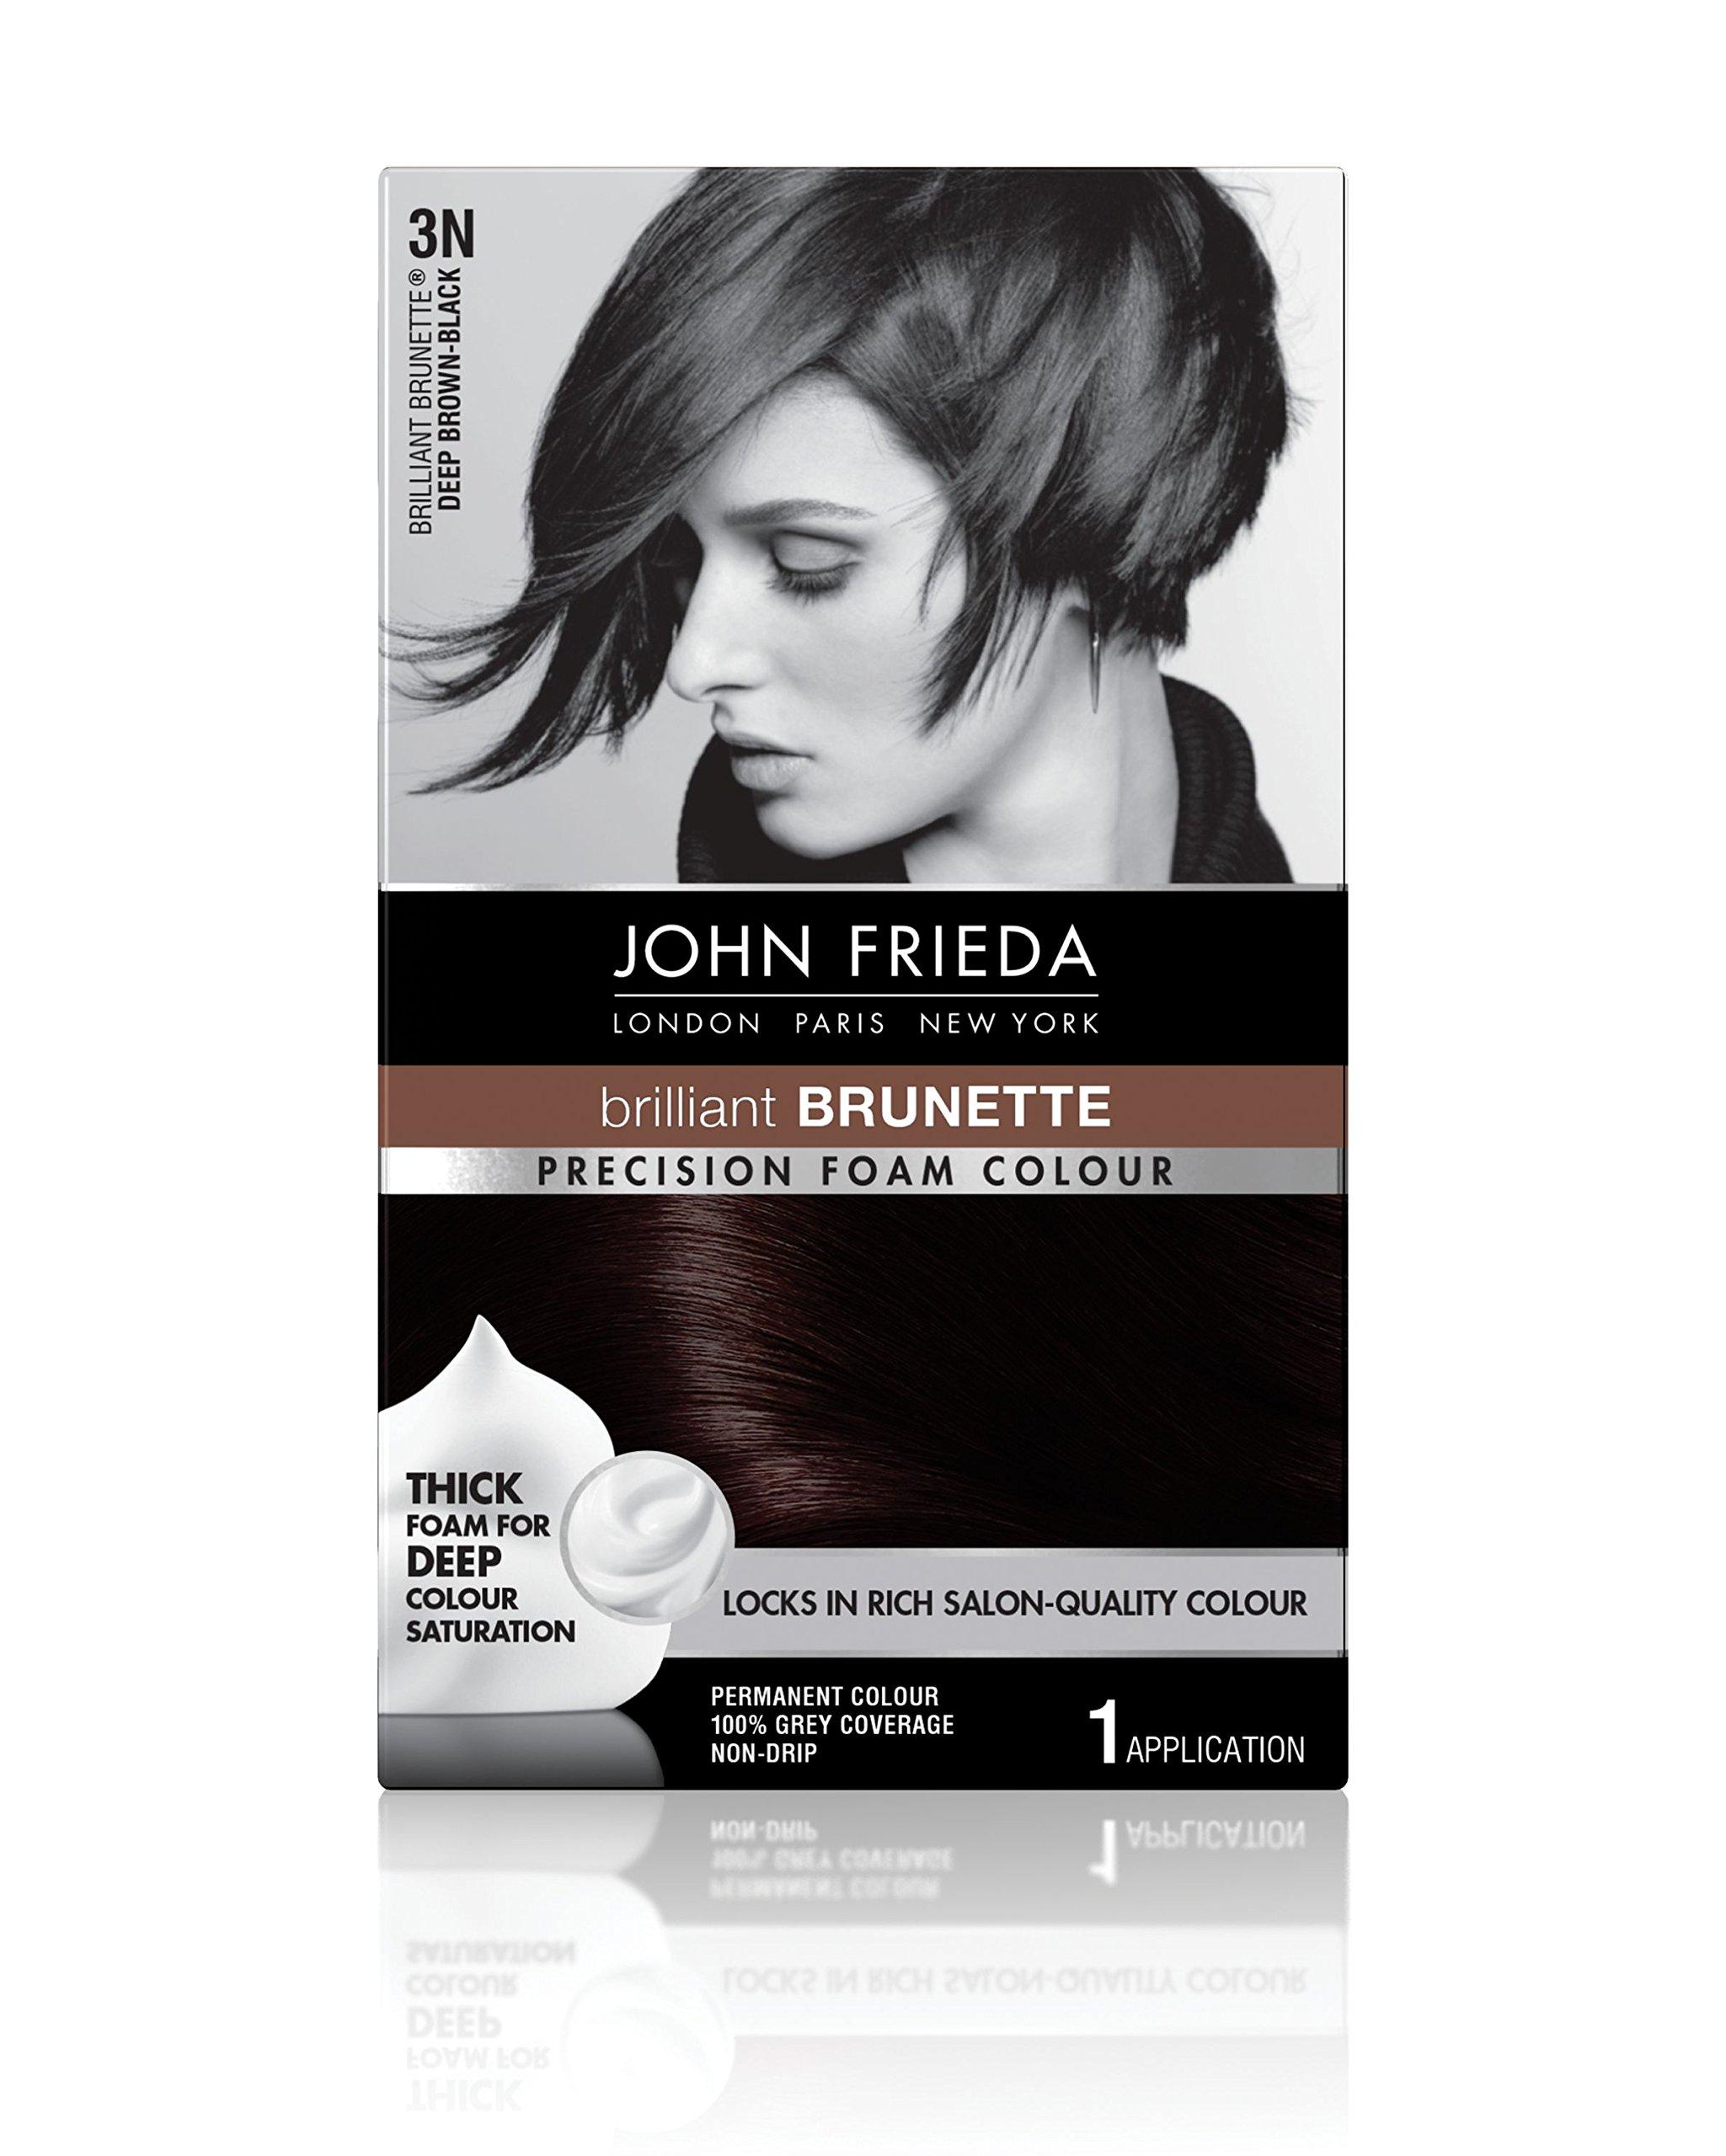 Frankel & Frankel John Frieda Precision 3n Foam Permanent Colour, Deep Brown Black - Kit, 2.4 Oz by John Frieda